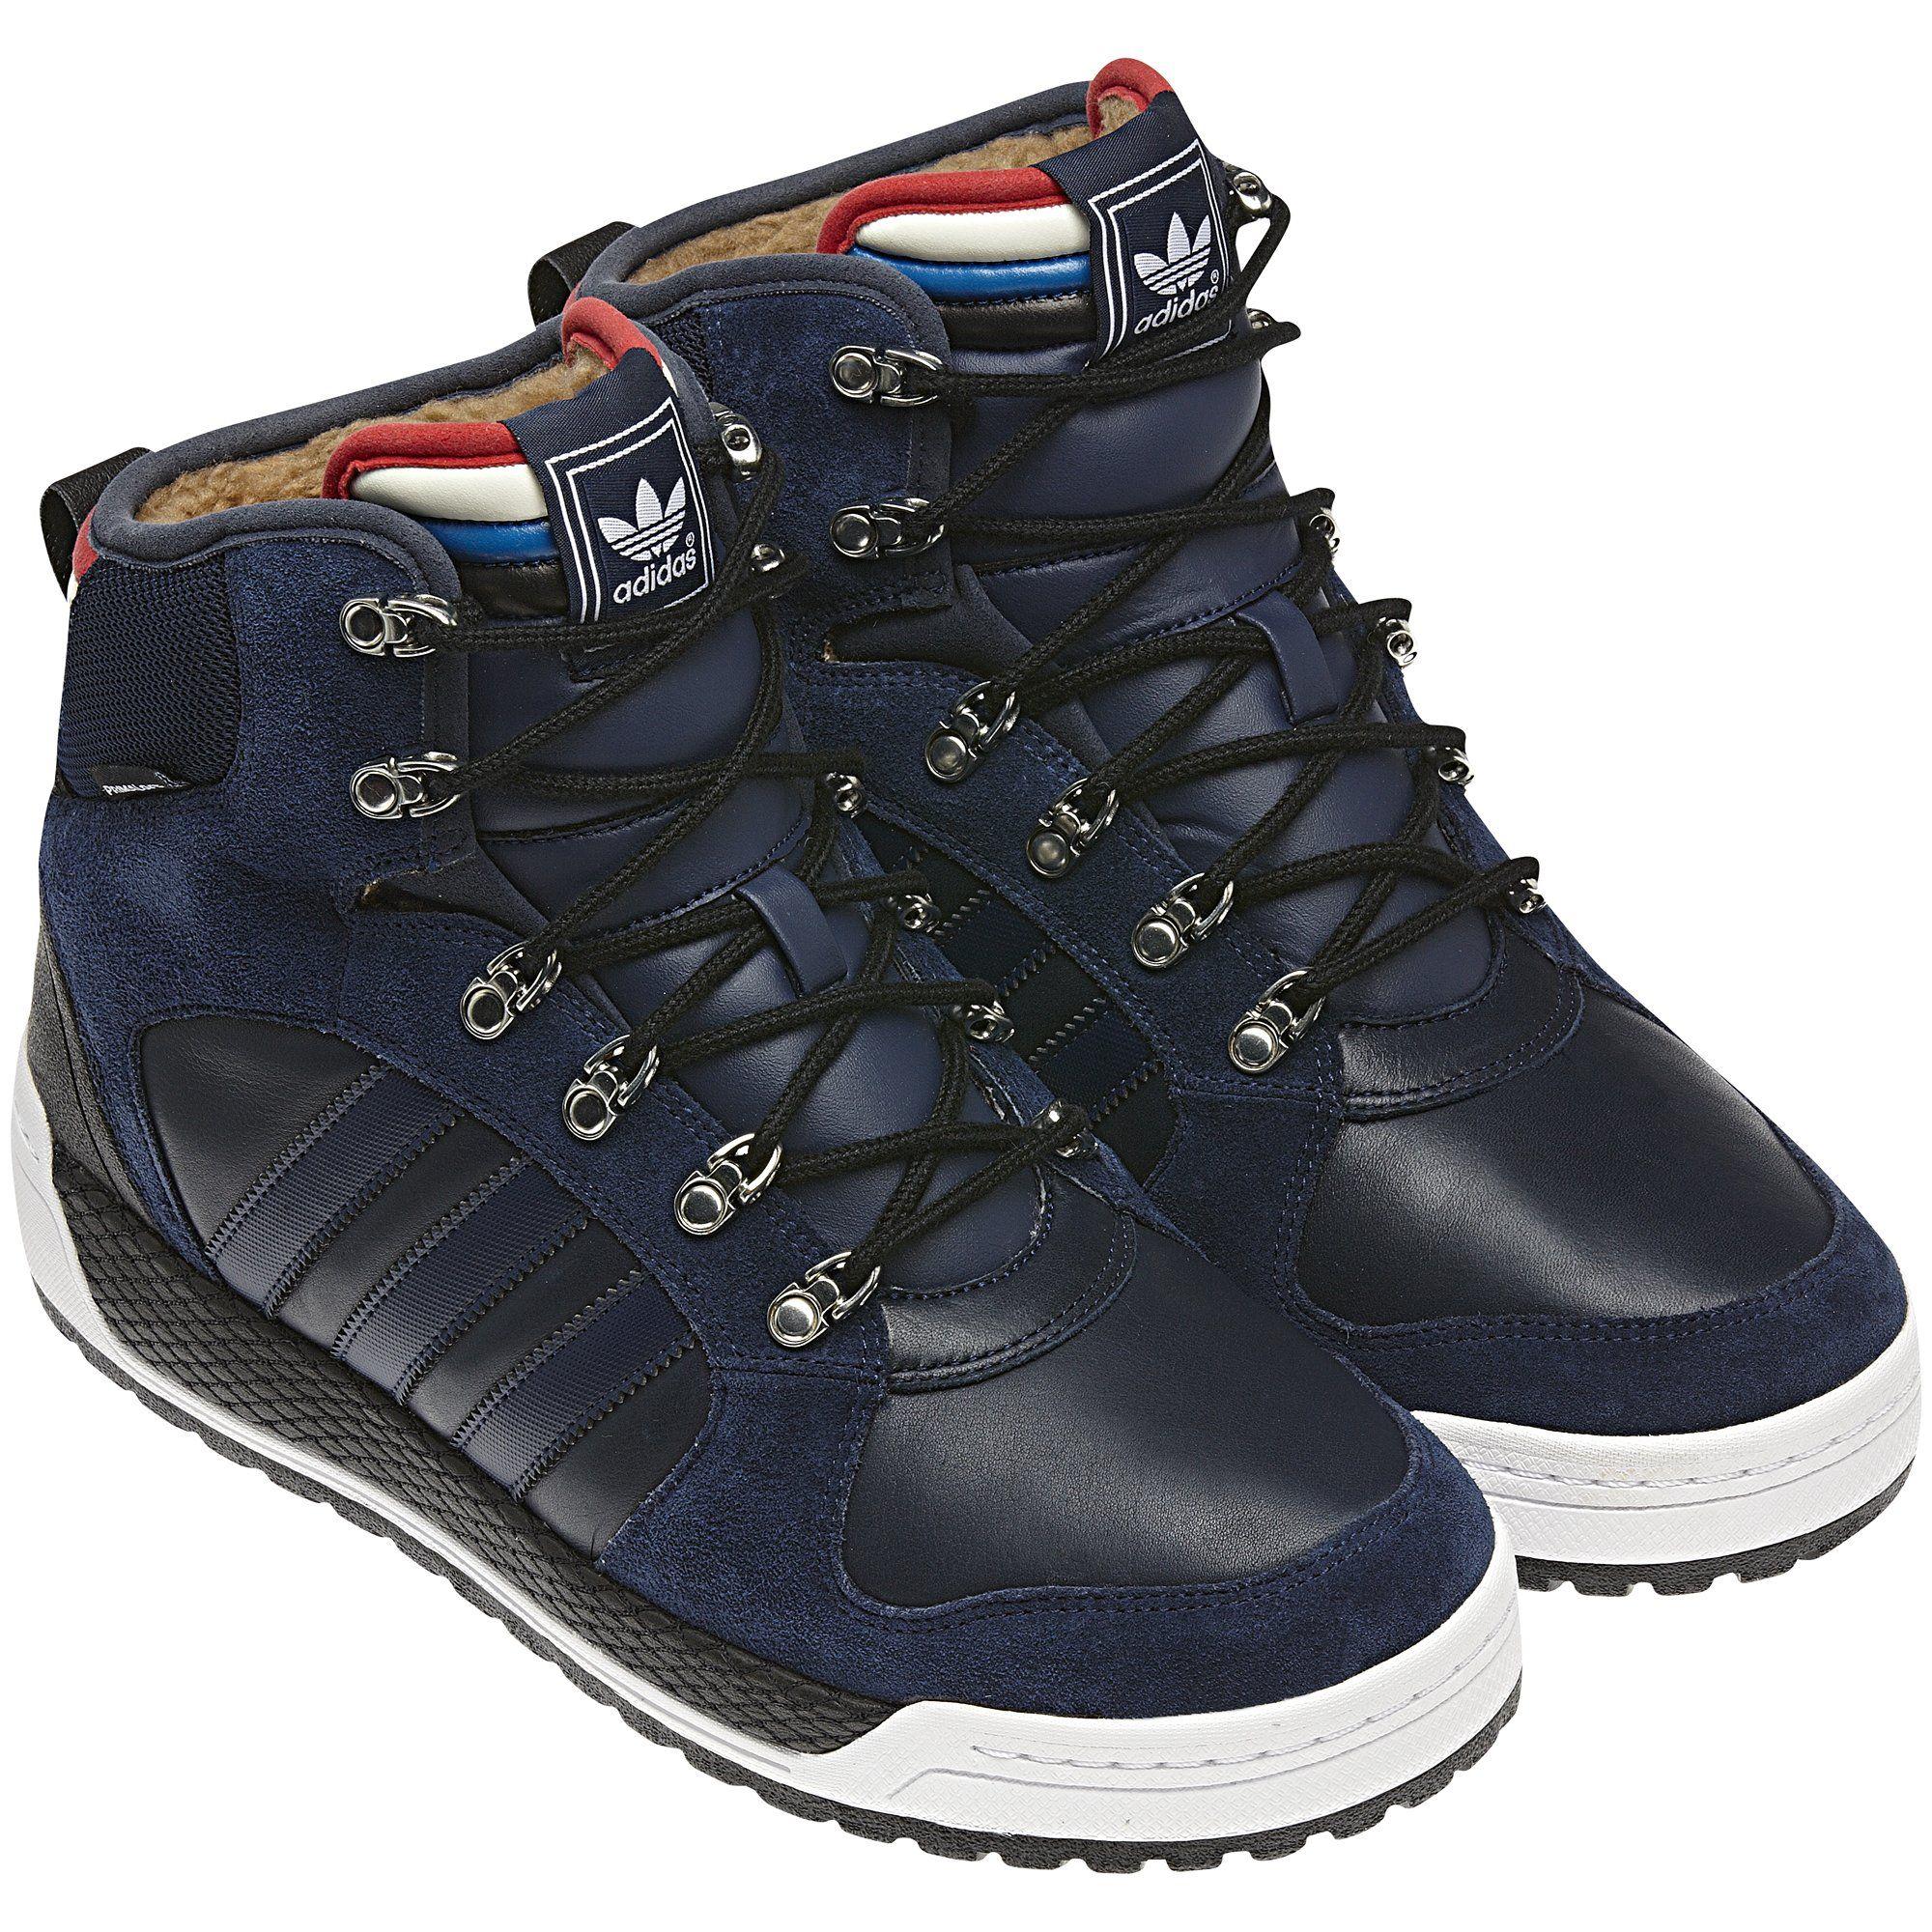 adidas Winter Ball Boots | sneakers | Adidas boots, Adidas